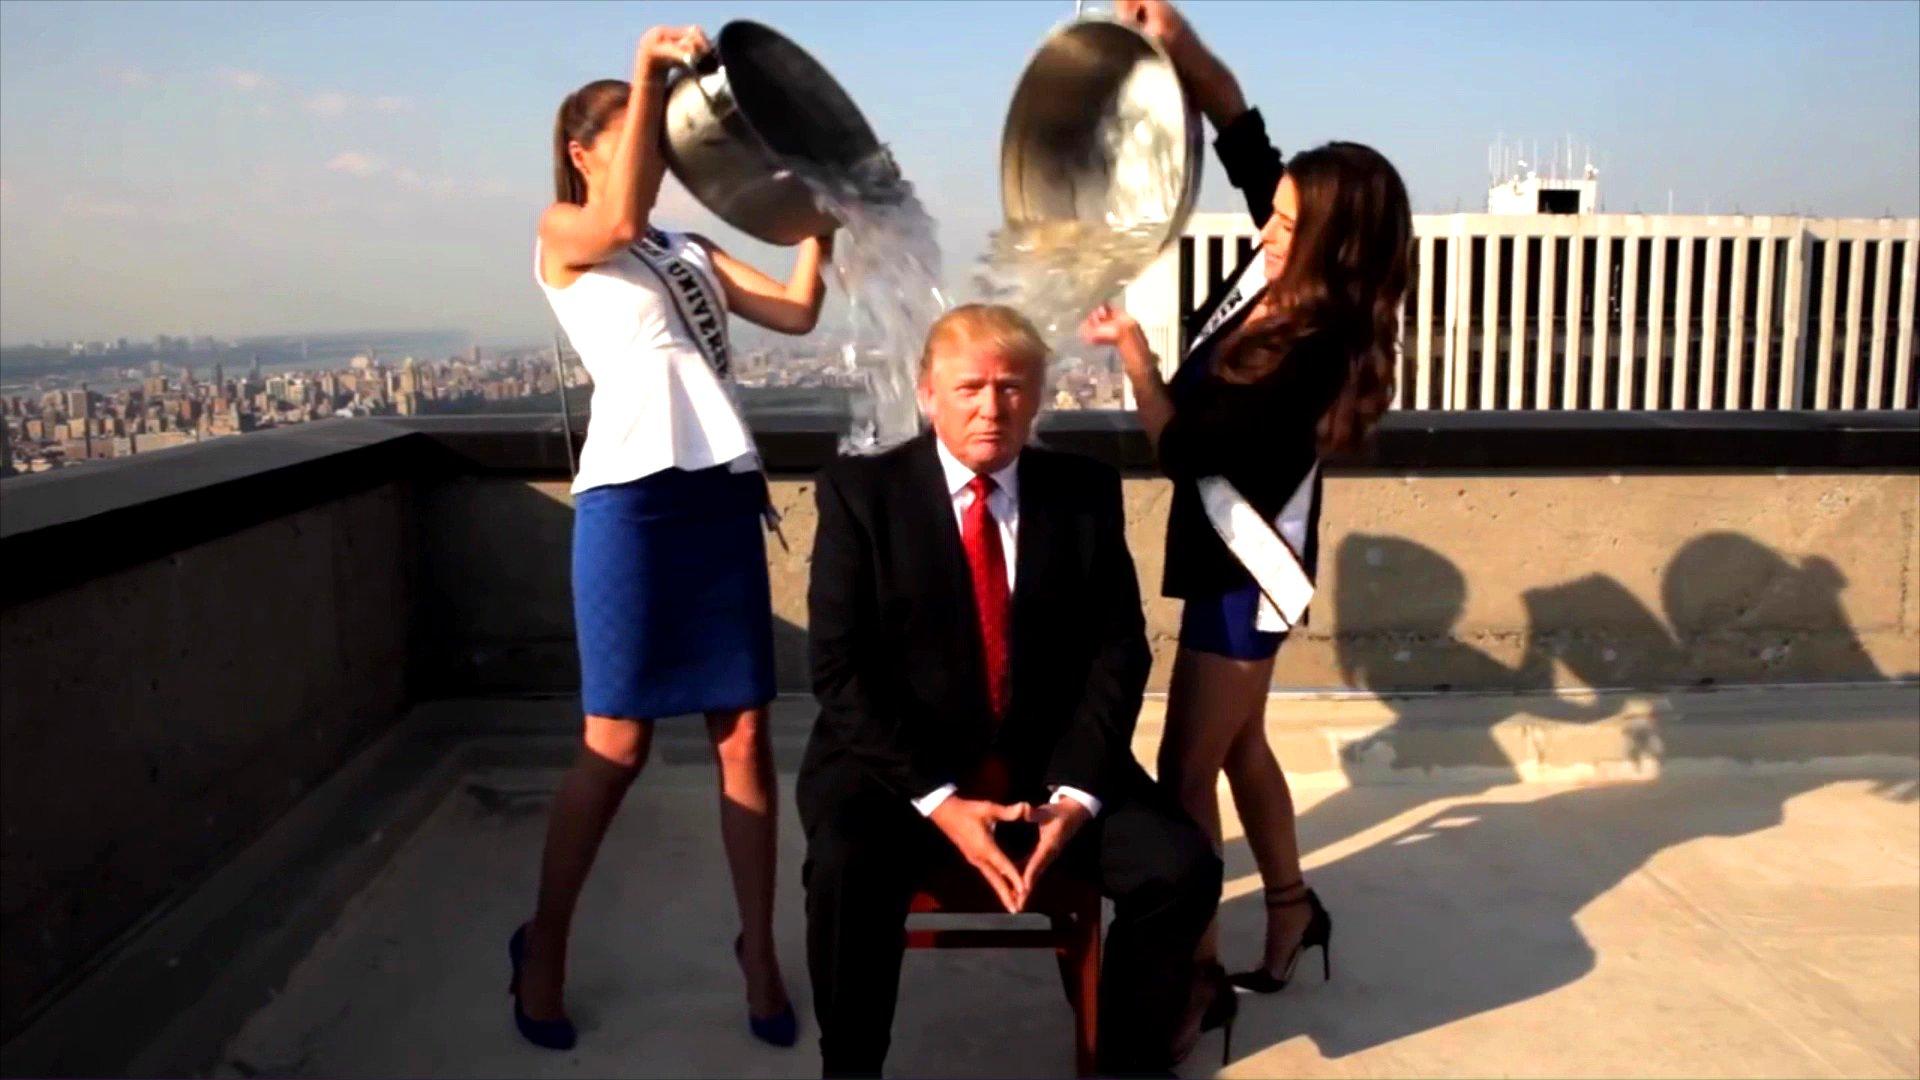 Donald Trumps Ice Bucket Challenge.